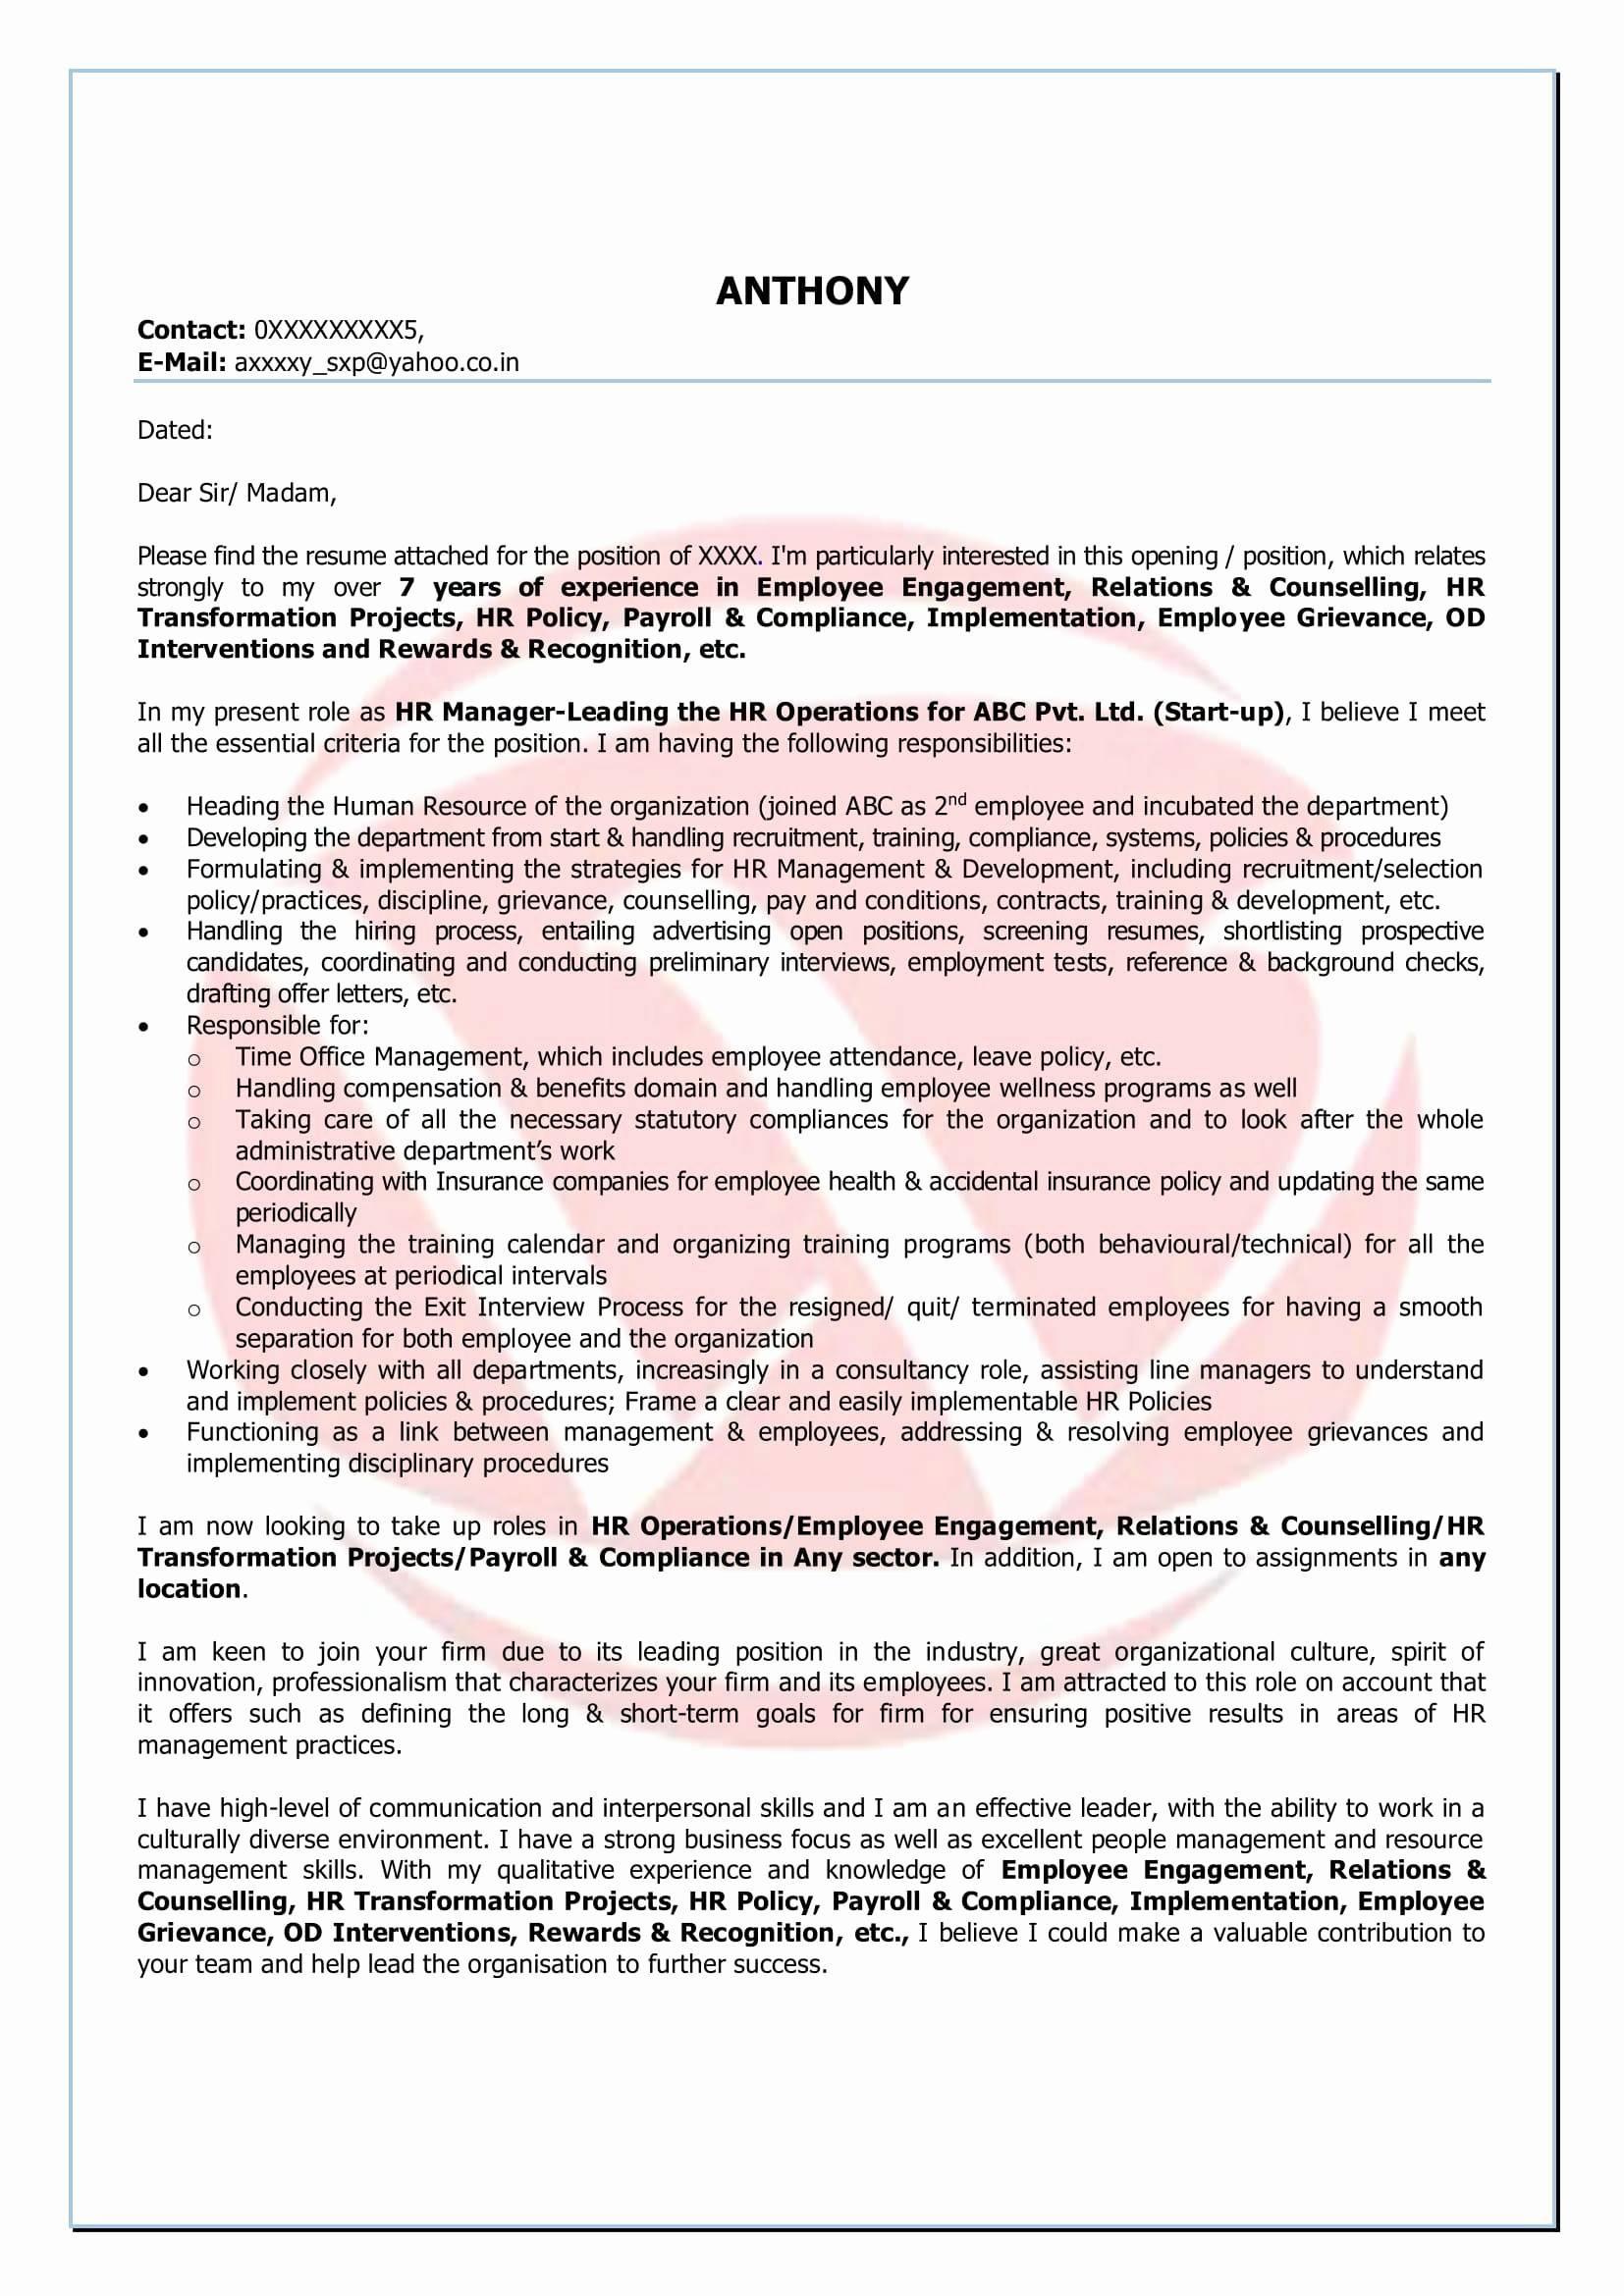 Letter Of Compliance Template - Unique Friendly Letter Template